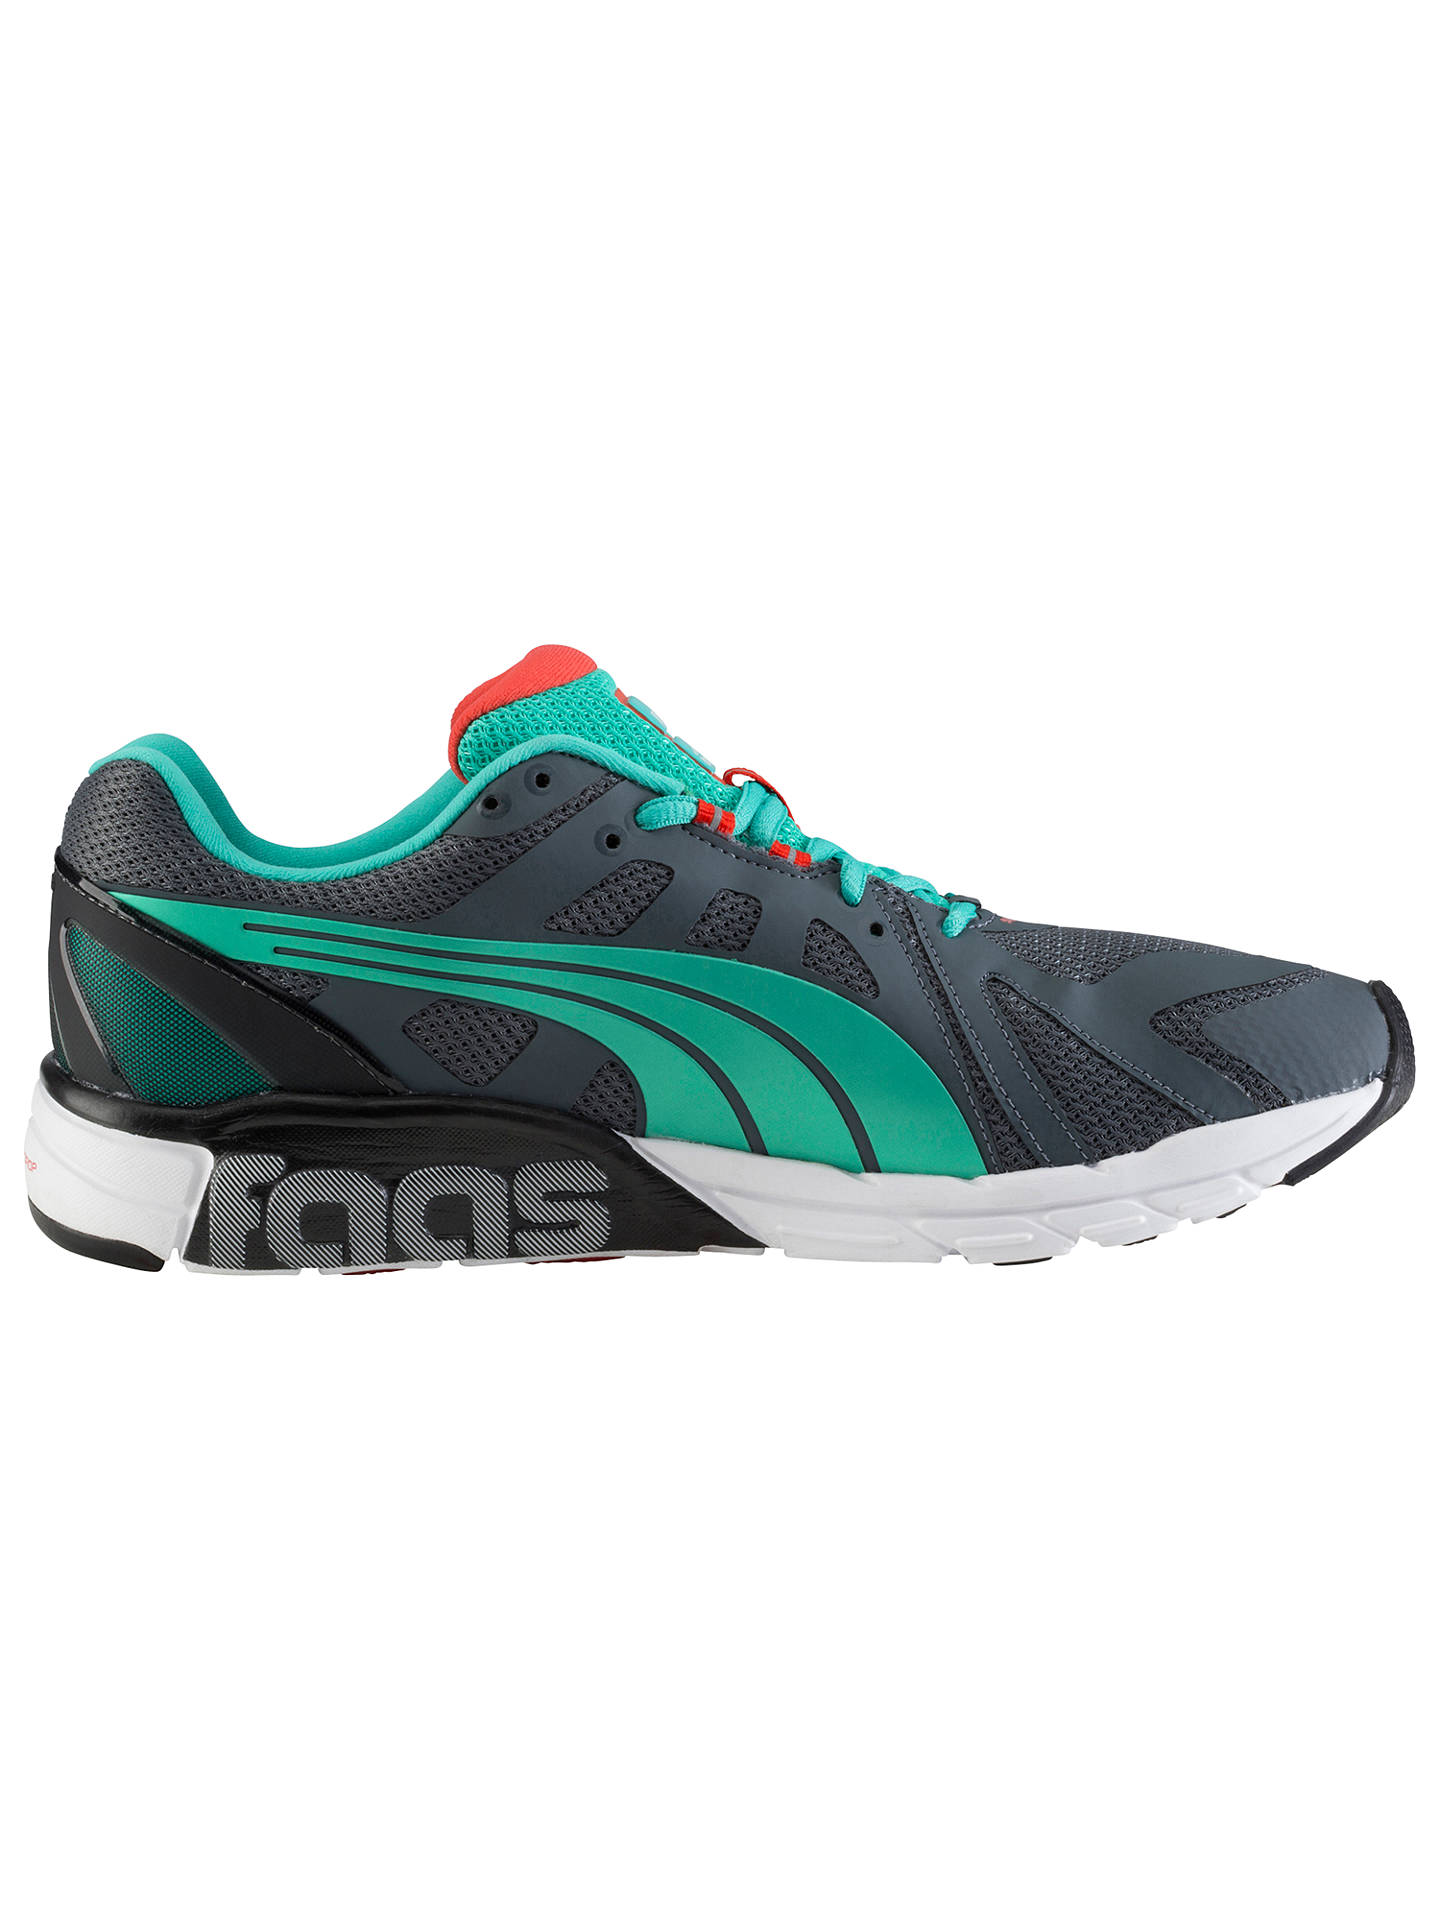 b2dfe8f7cb11 Puma Faas 600 S Men s Running Shoes at John Lewis   Partners